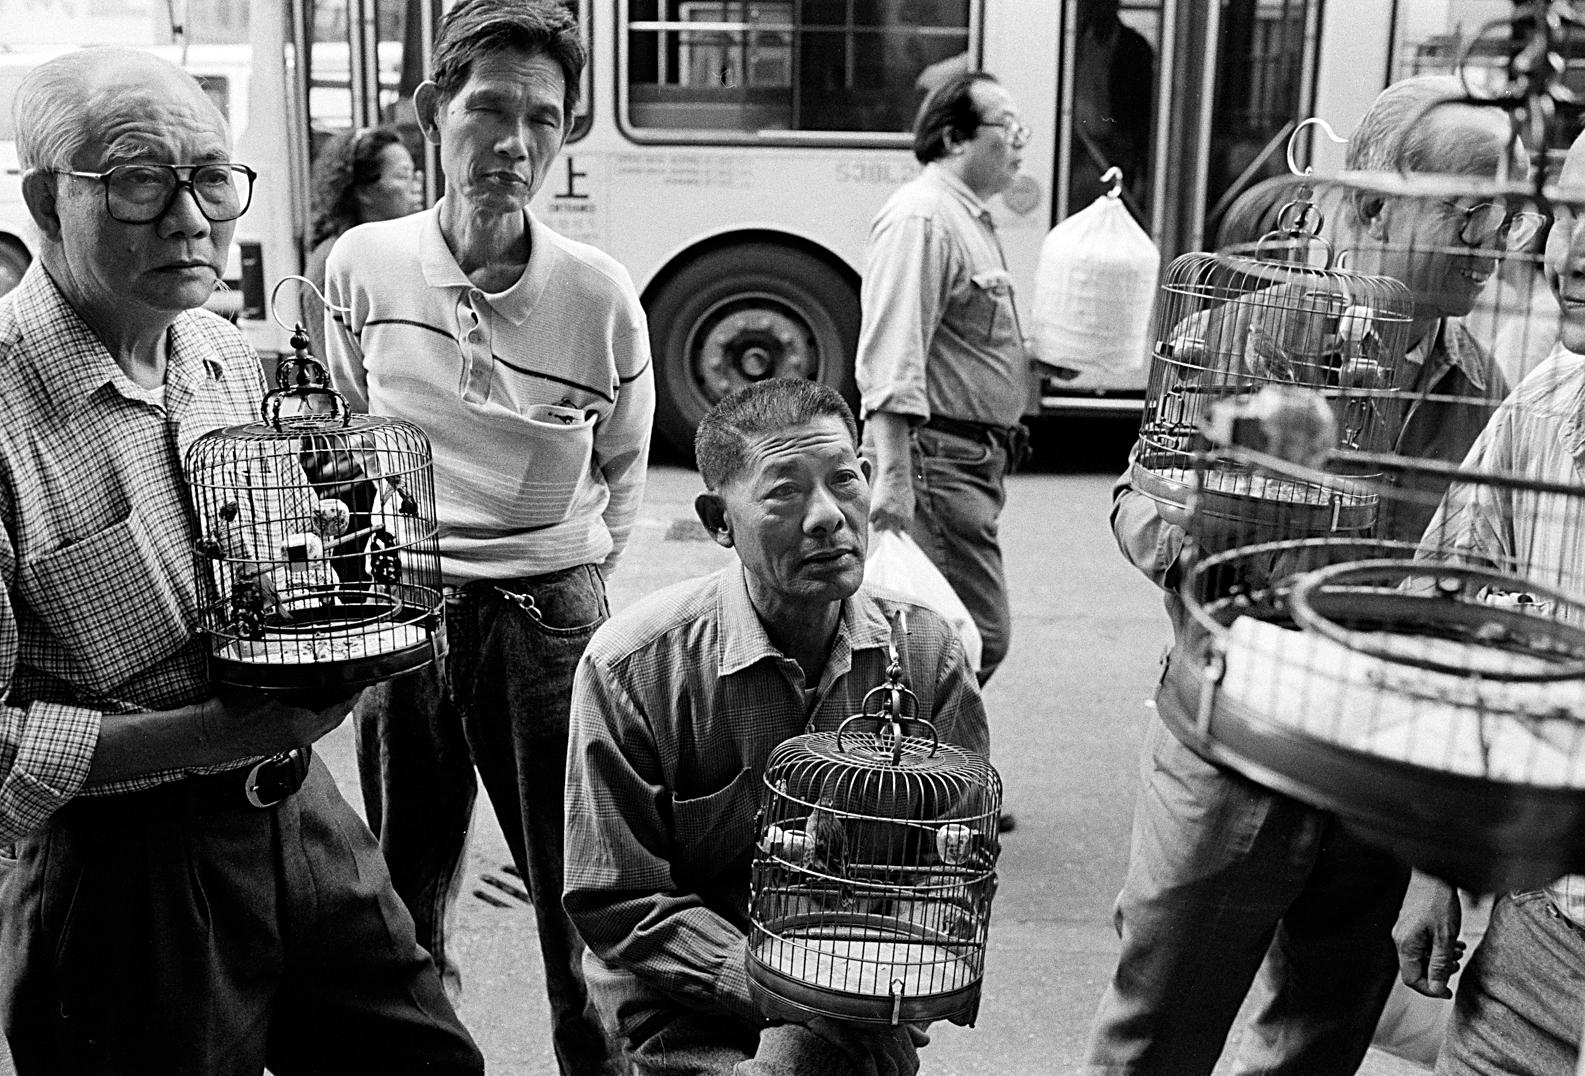 hk_birdmen_untitled_20130804.jpg